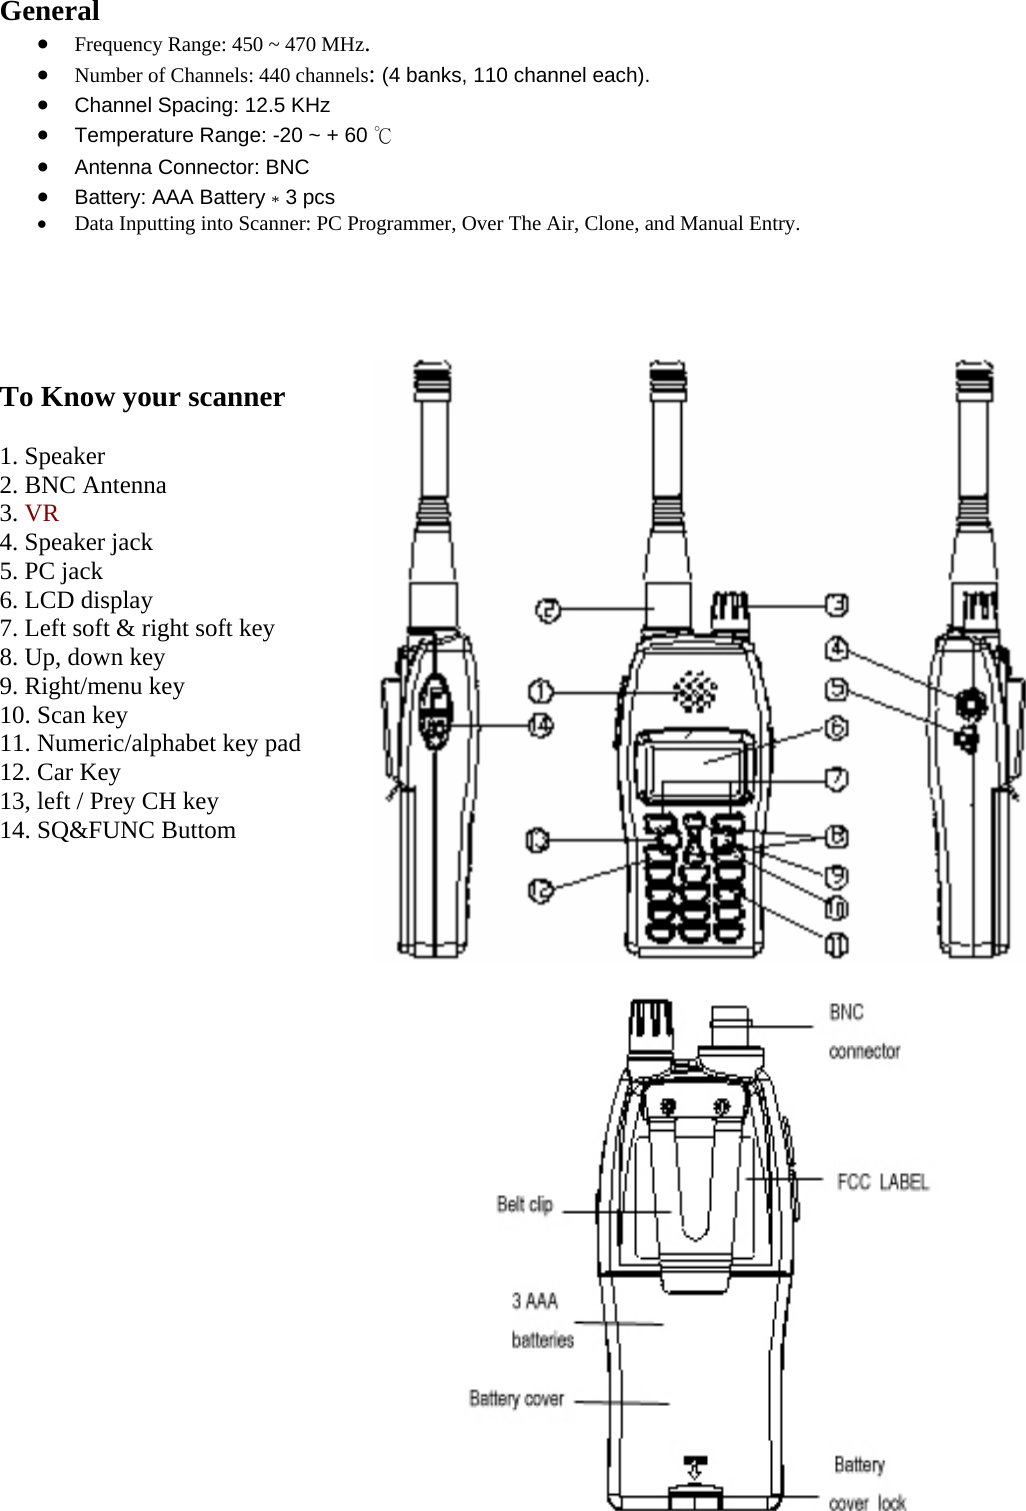 Racing Electronics RE3000 Racing Scanner User Manual RE 3000